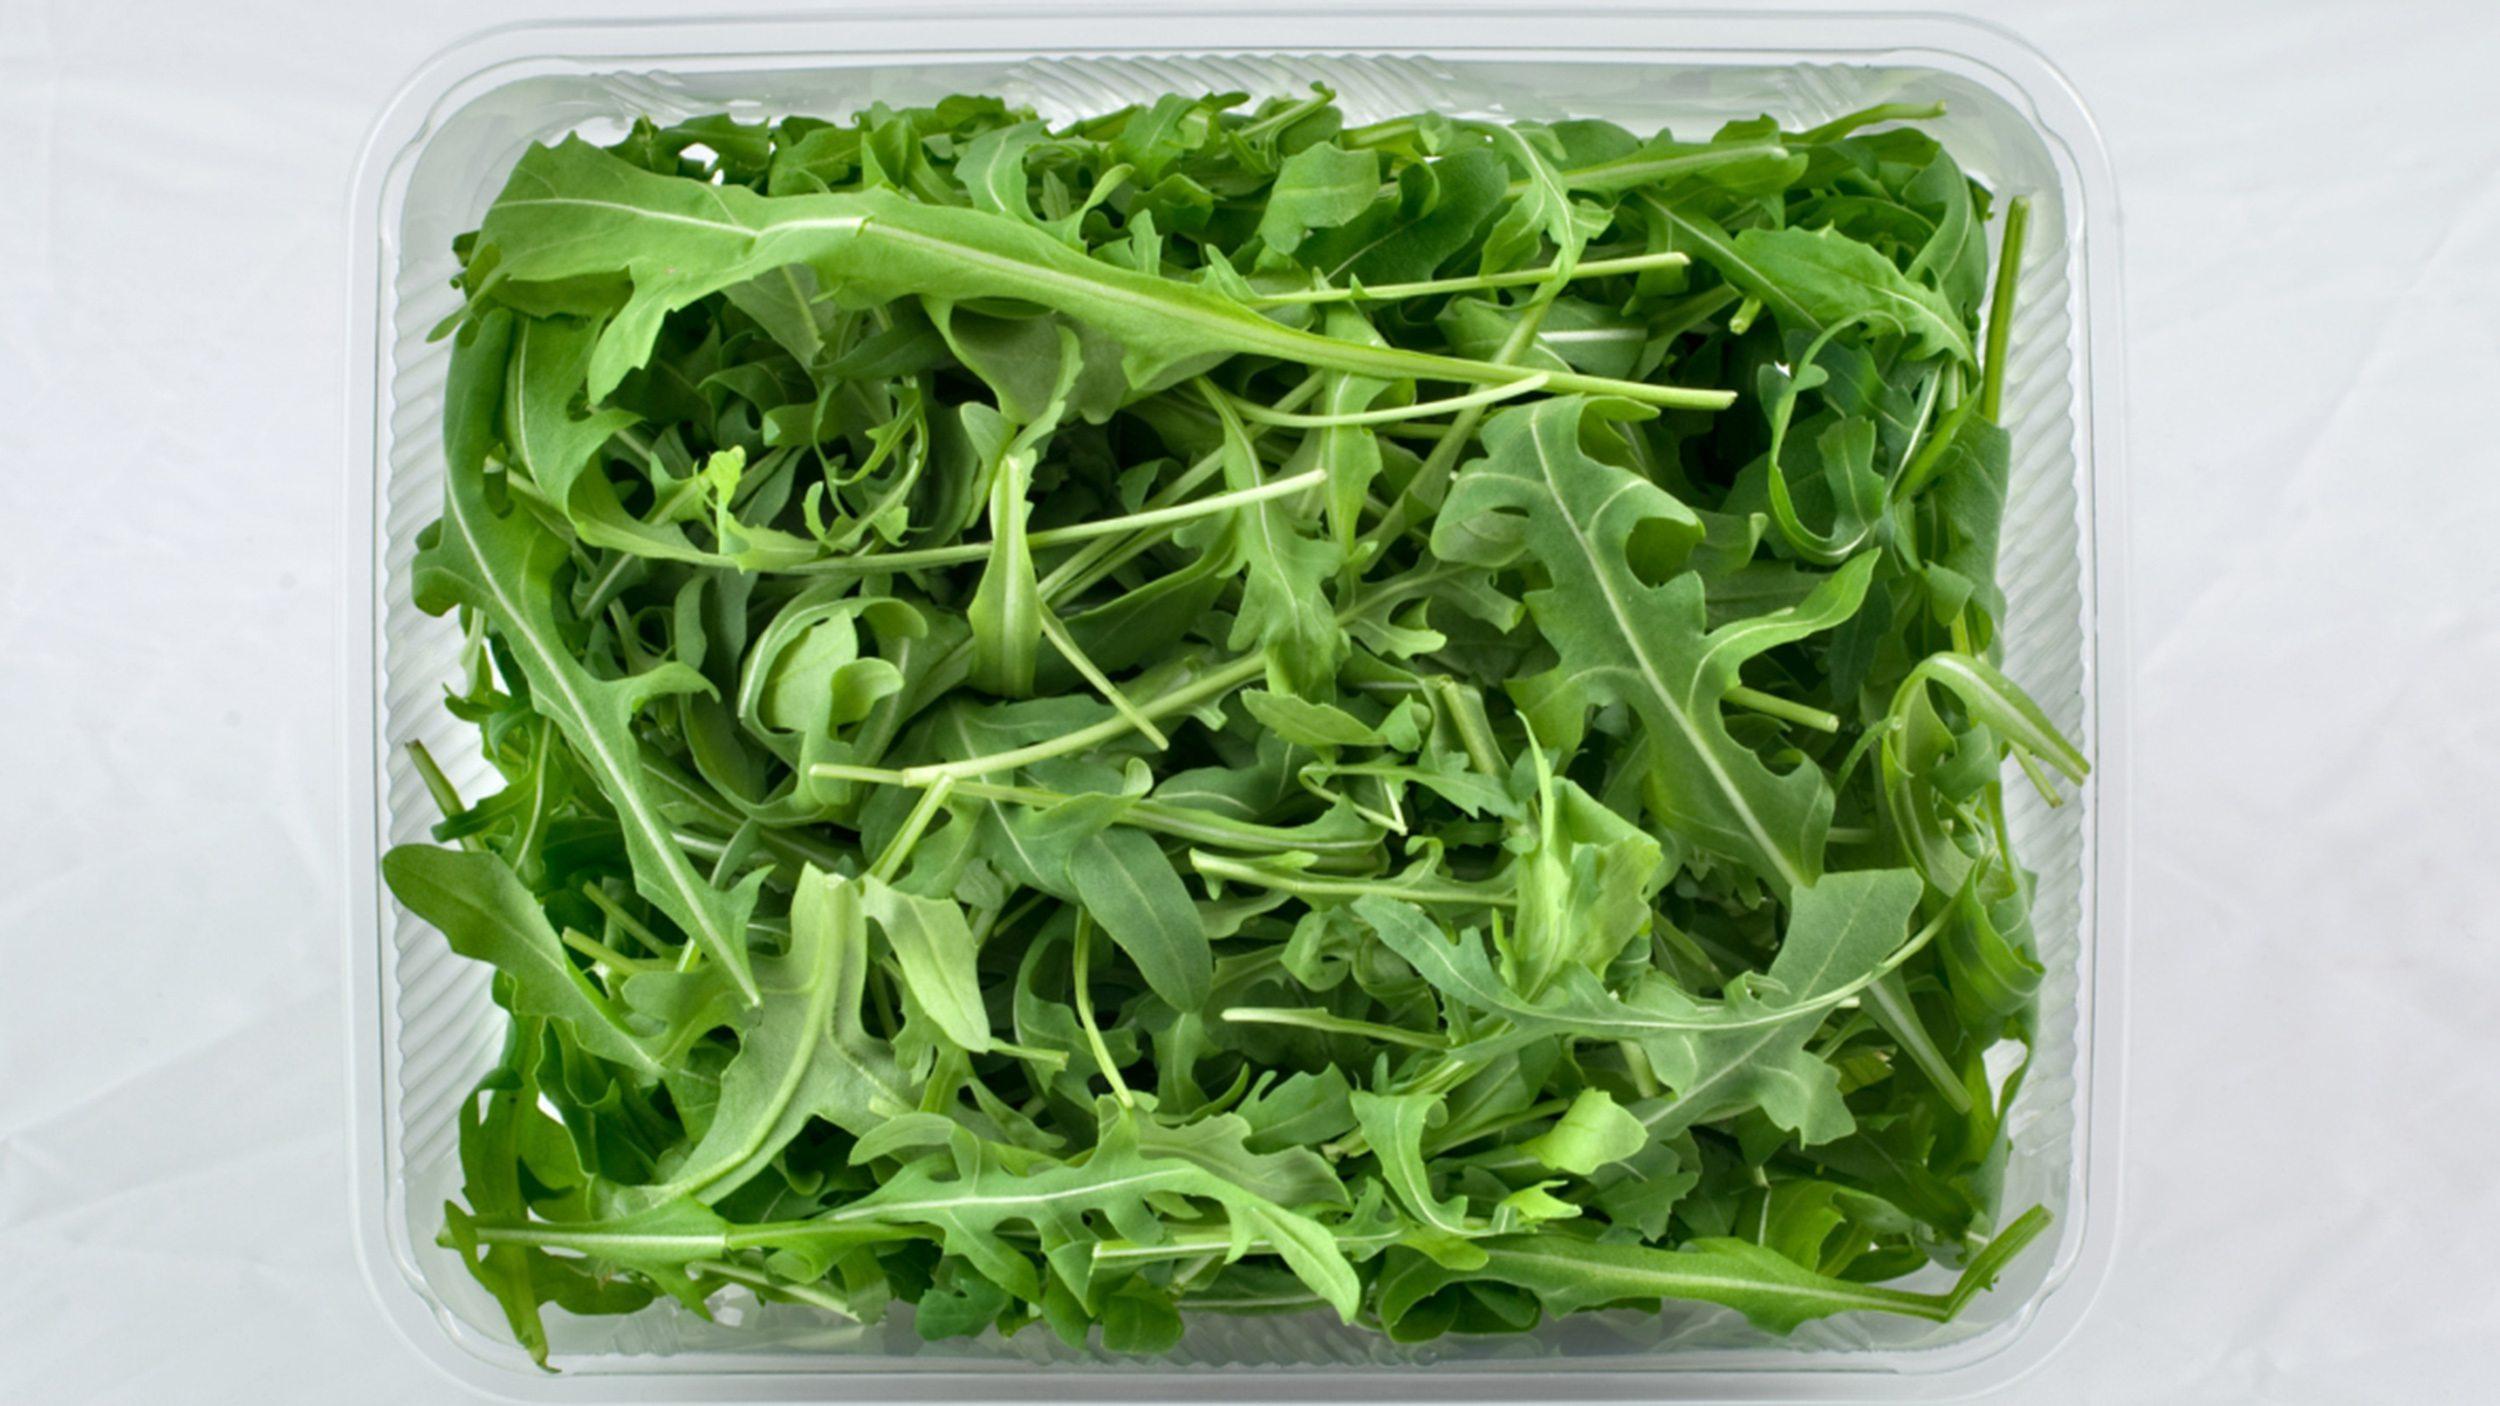 A box of salad